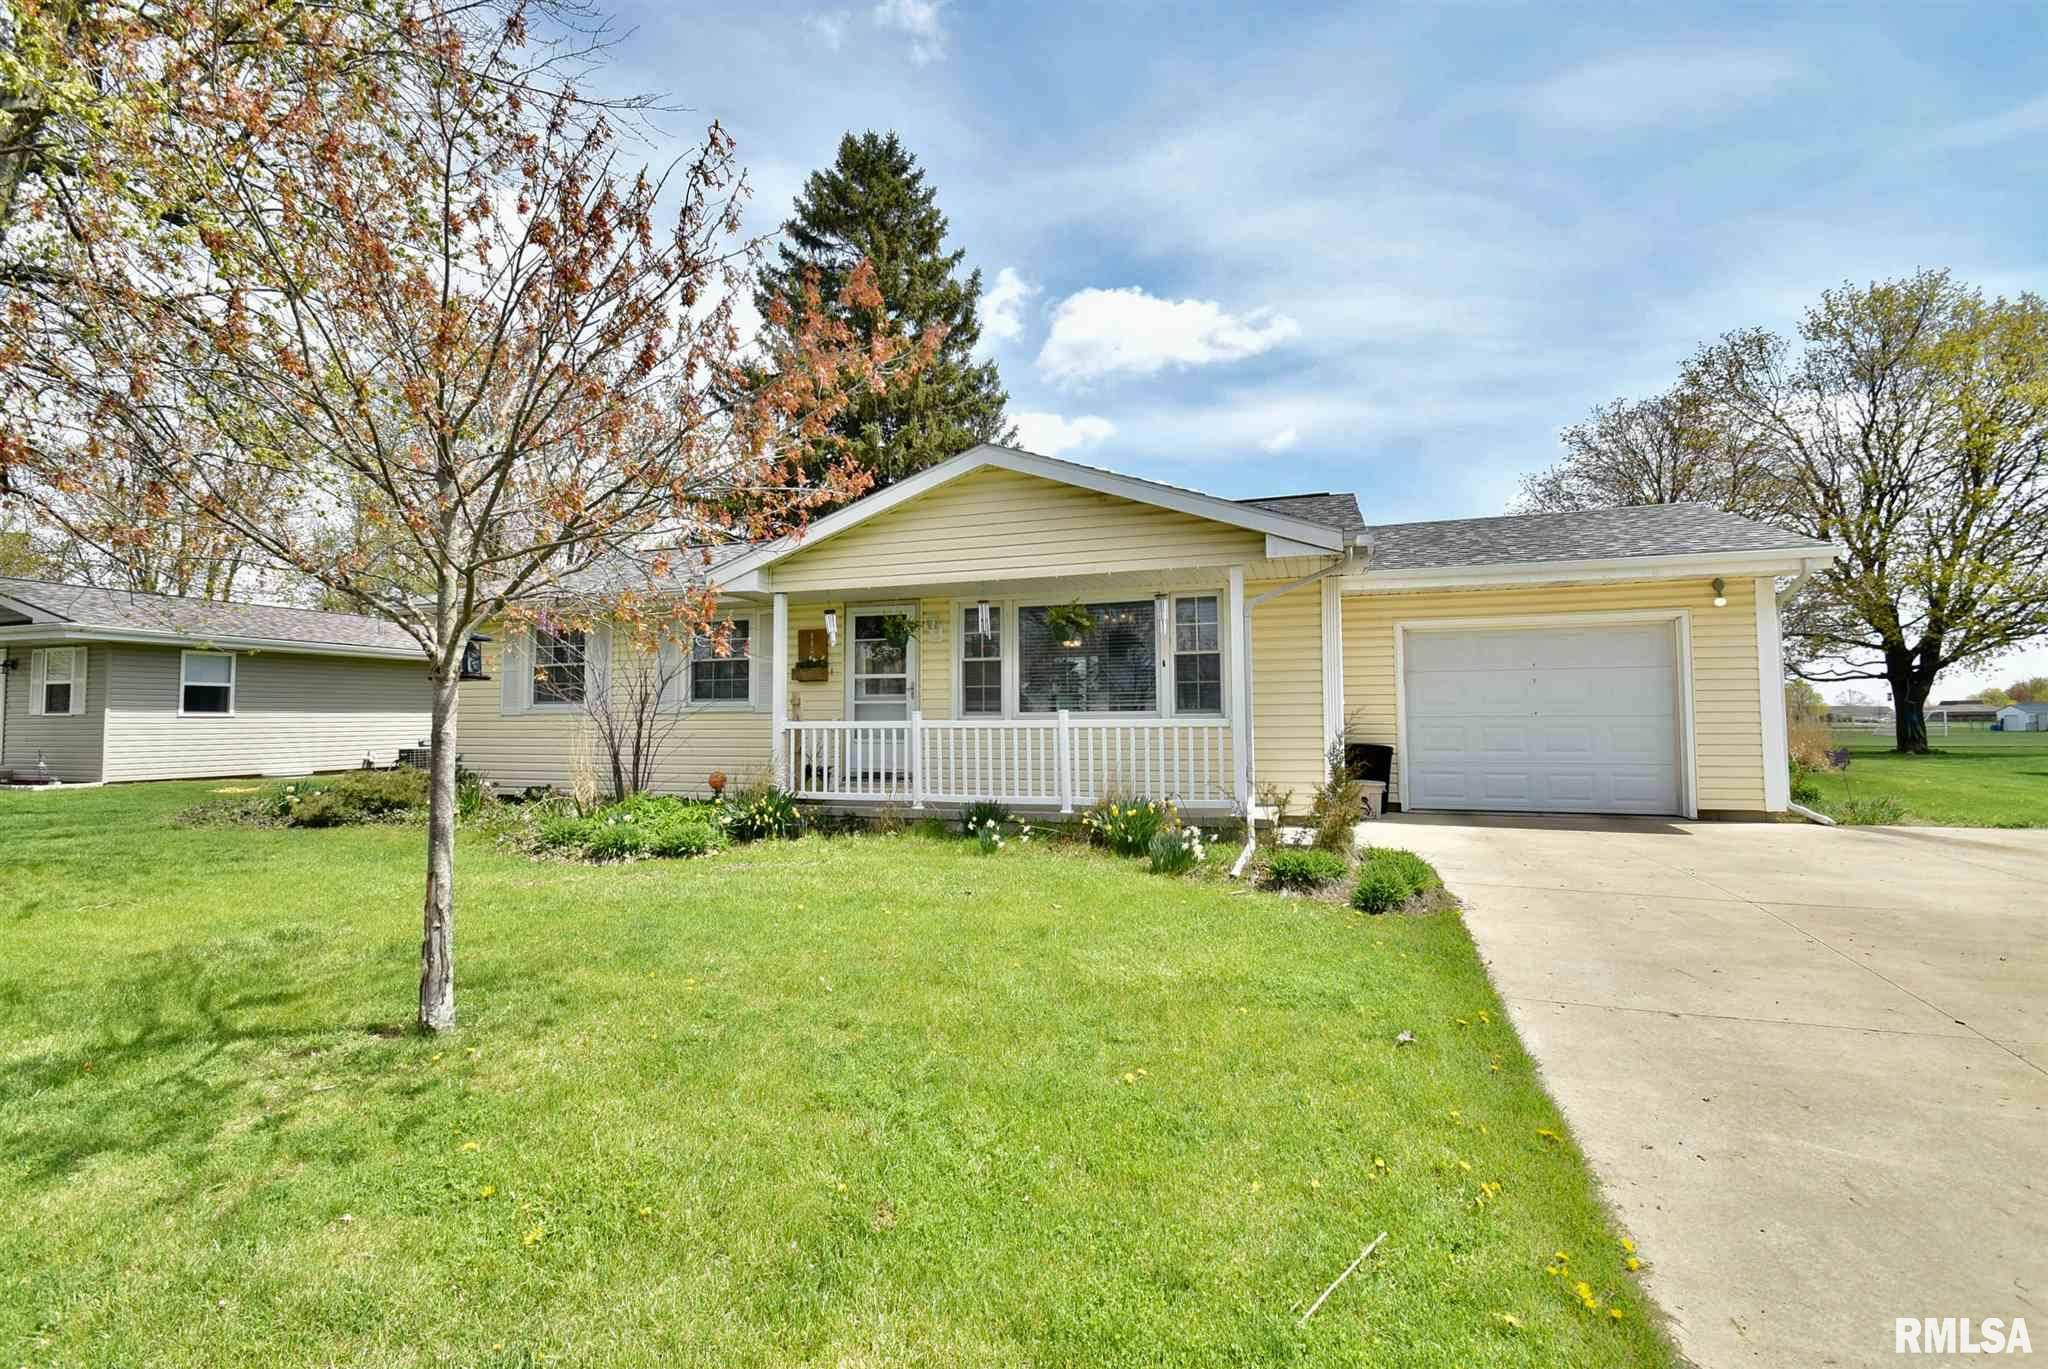 1102 N CHURCH Property Photo - Roanoke, IL real estate listing